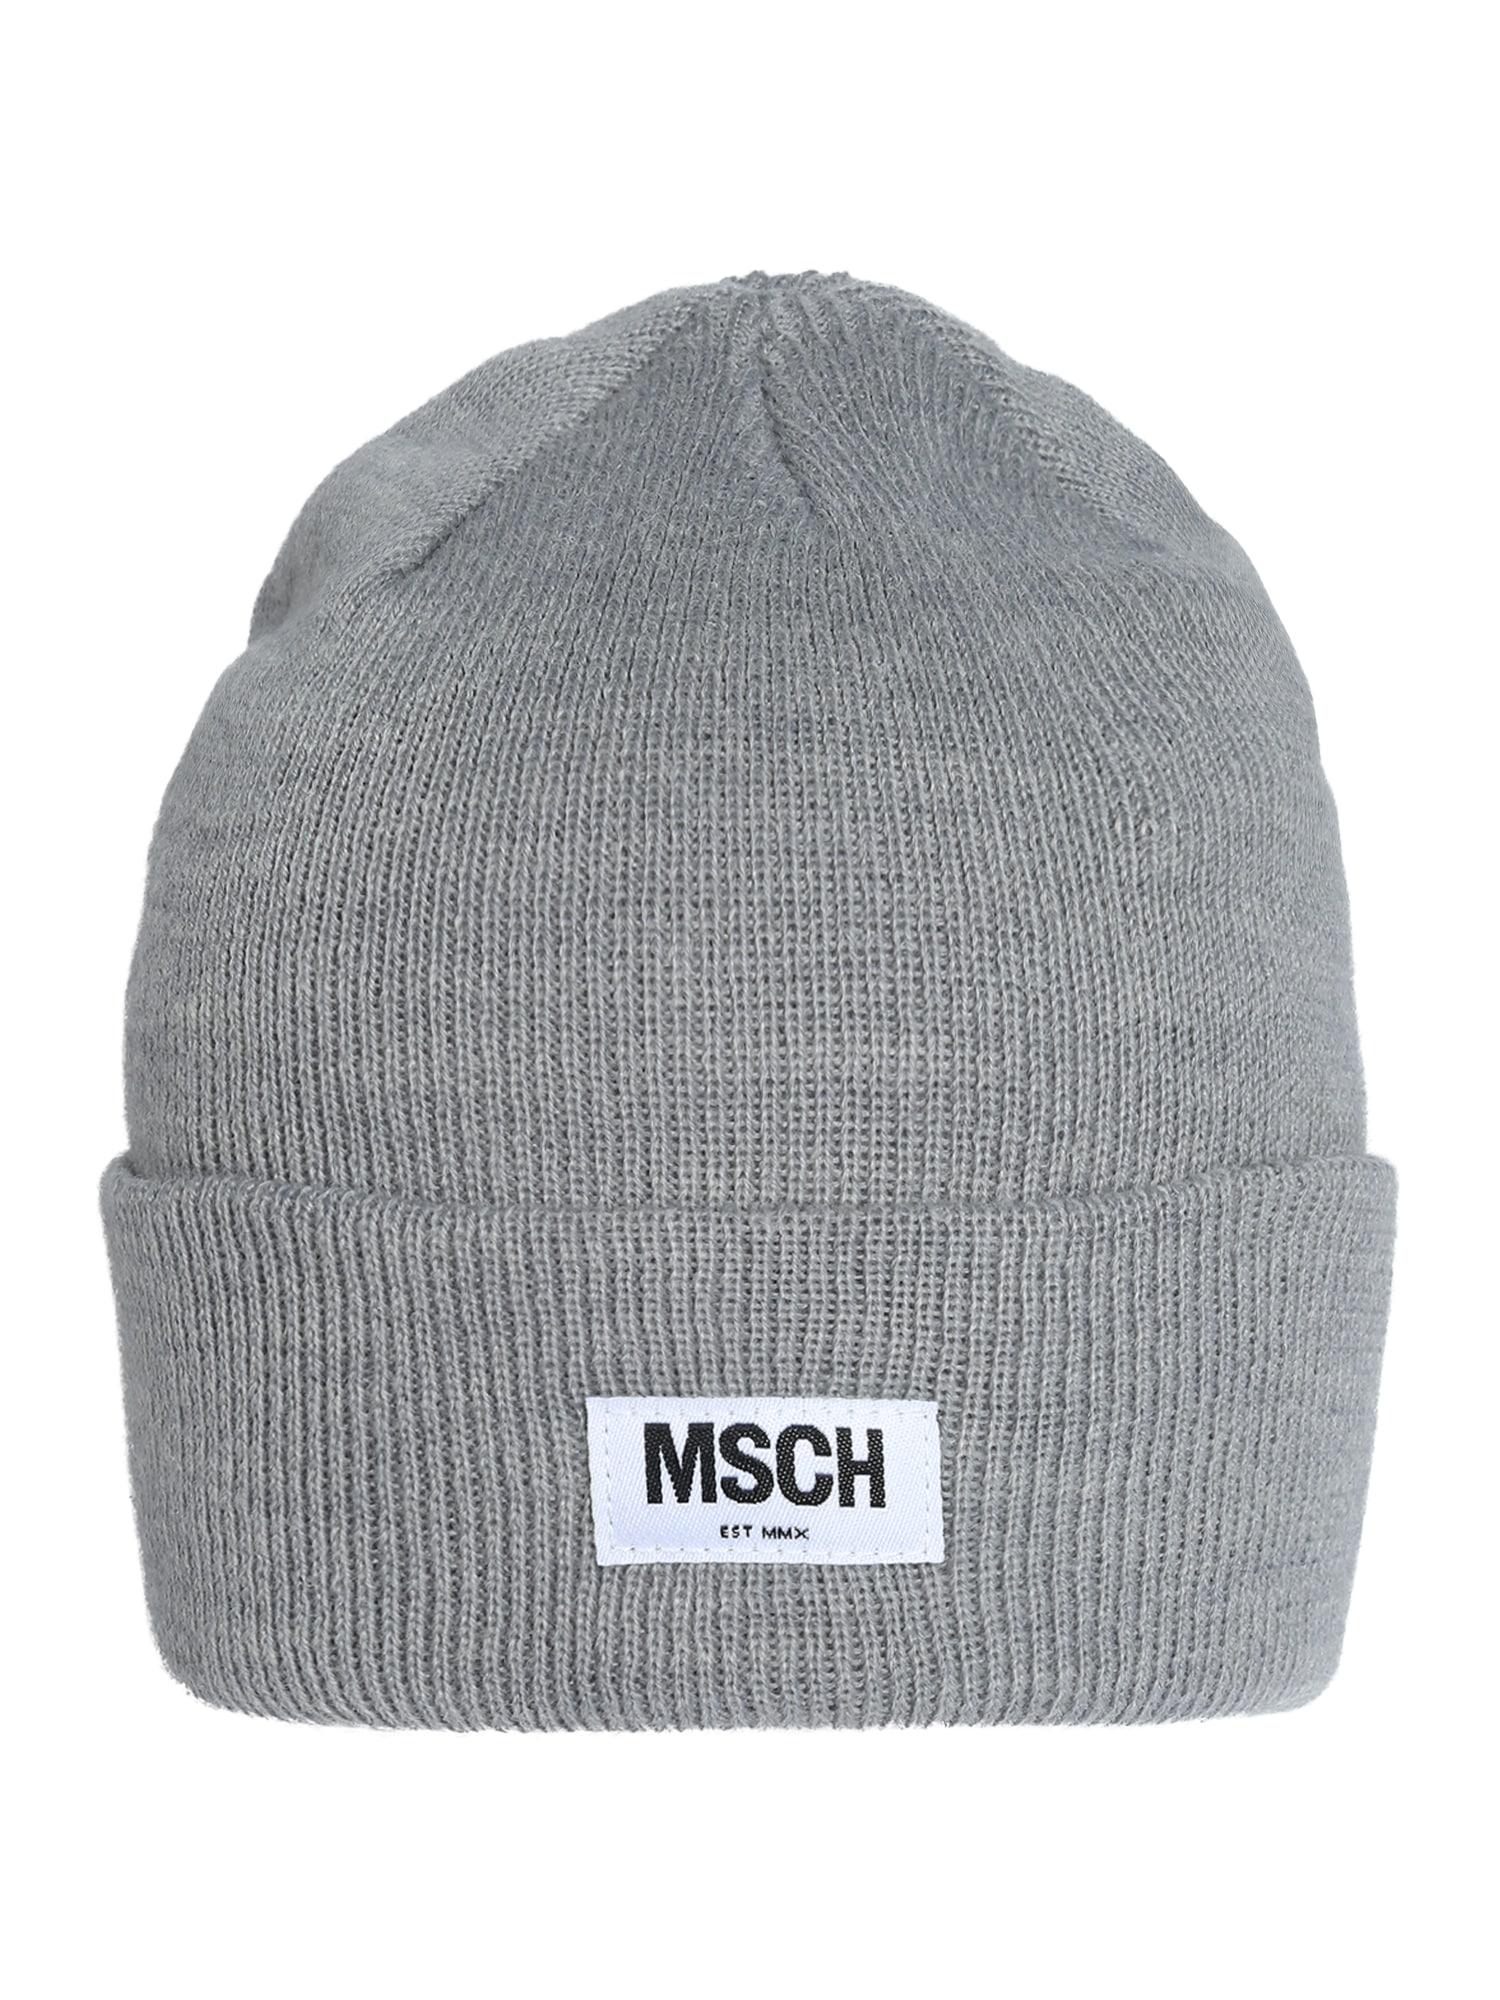 MOSS COPENHAGEN Megzta kepurė 'Mojo' šviesiai pilka